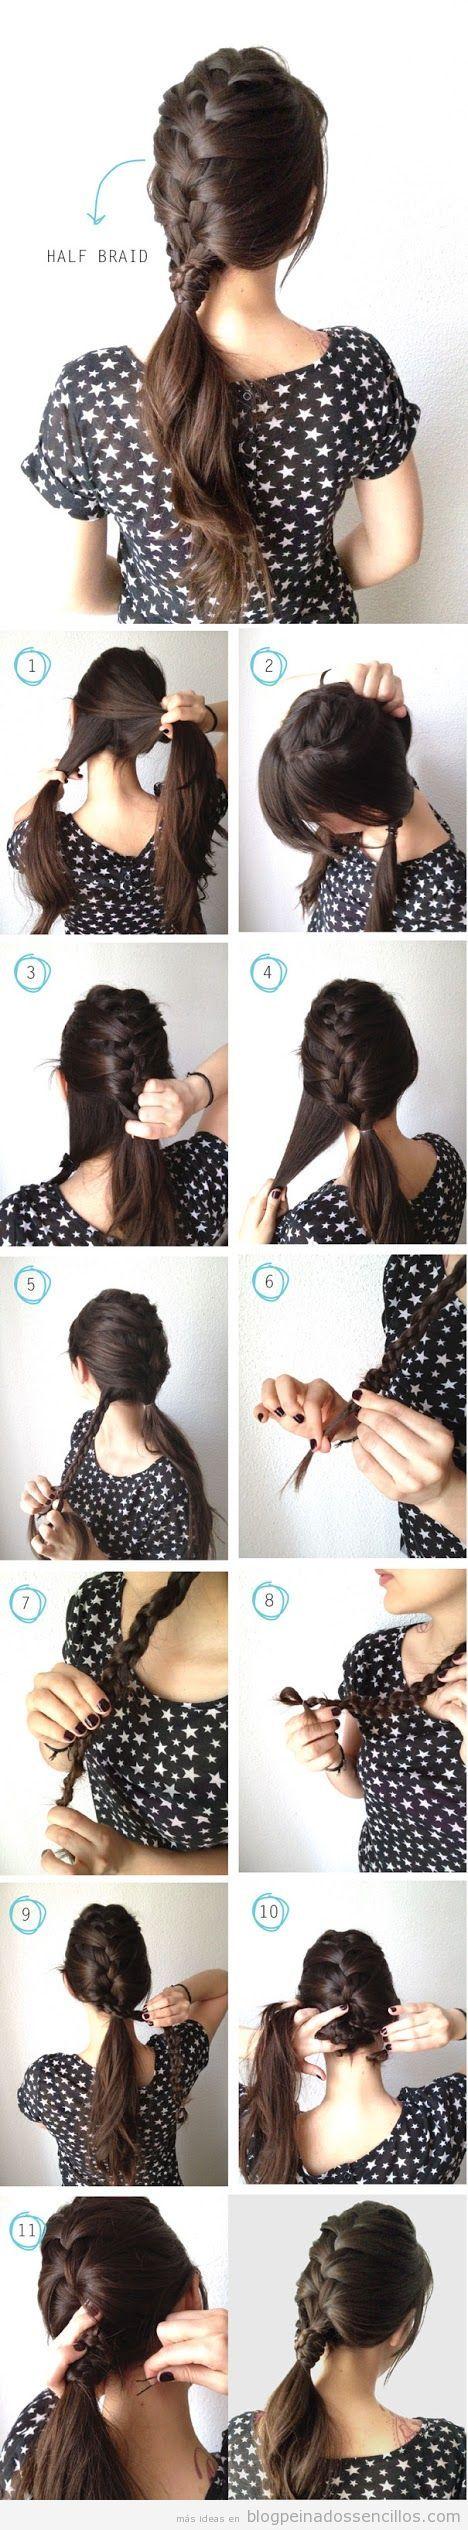 Peinado sencillo, tutorial media trenza paso a paso